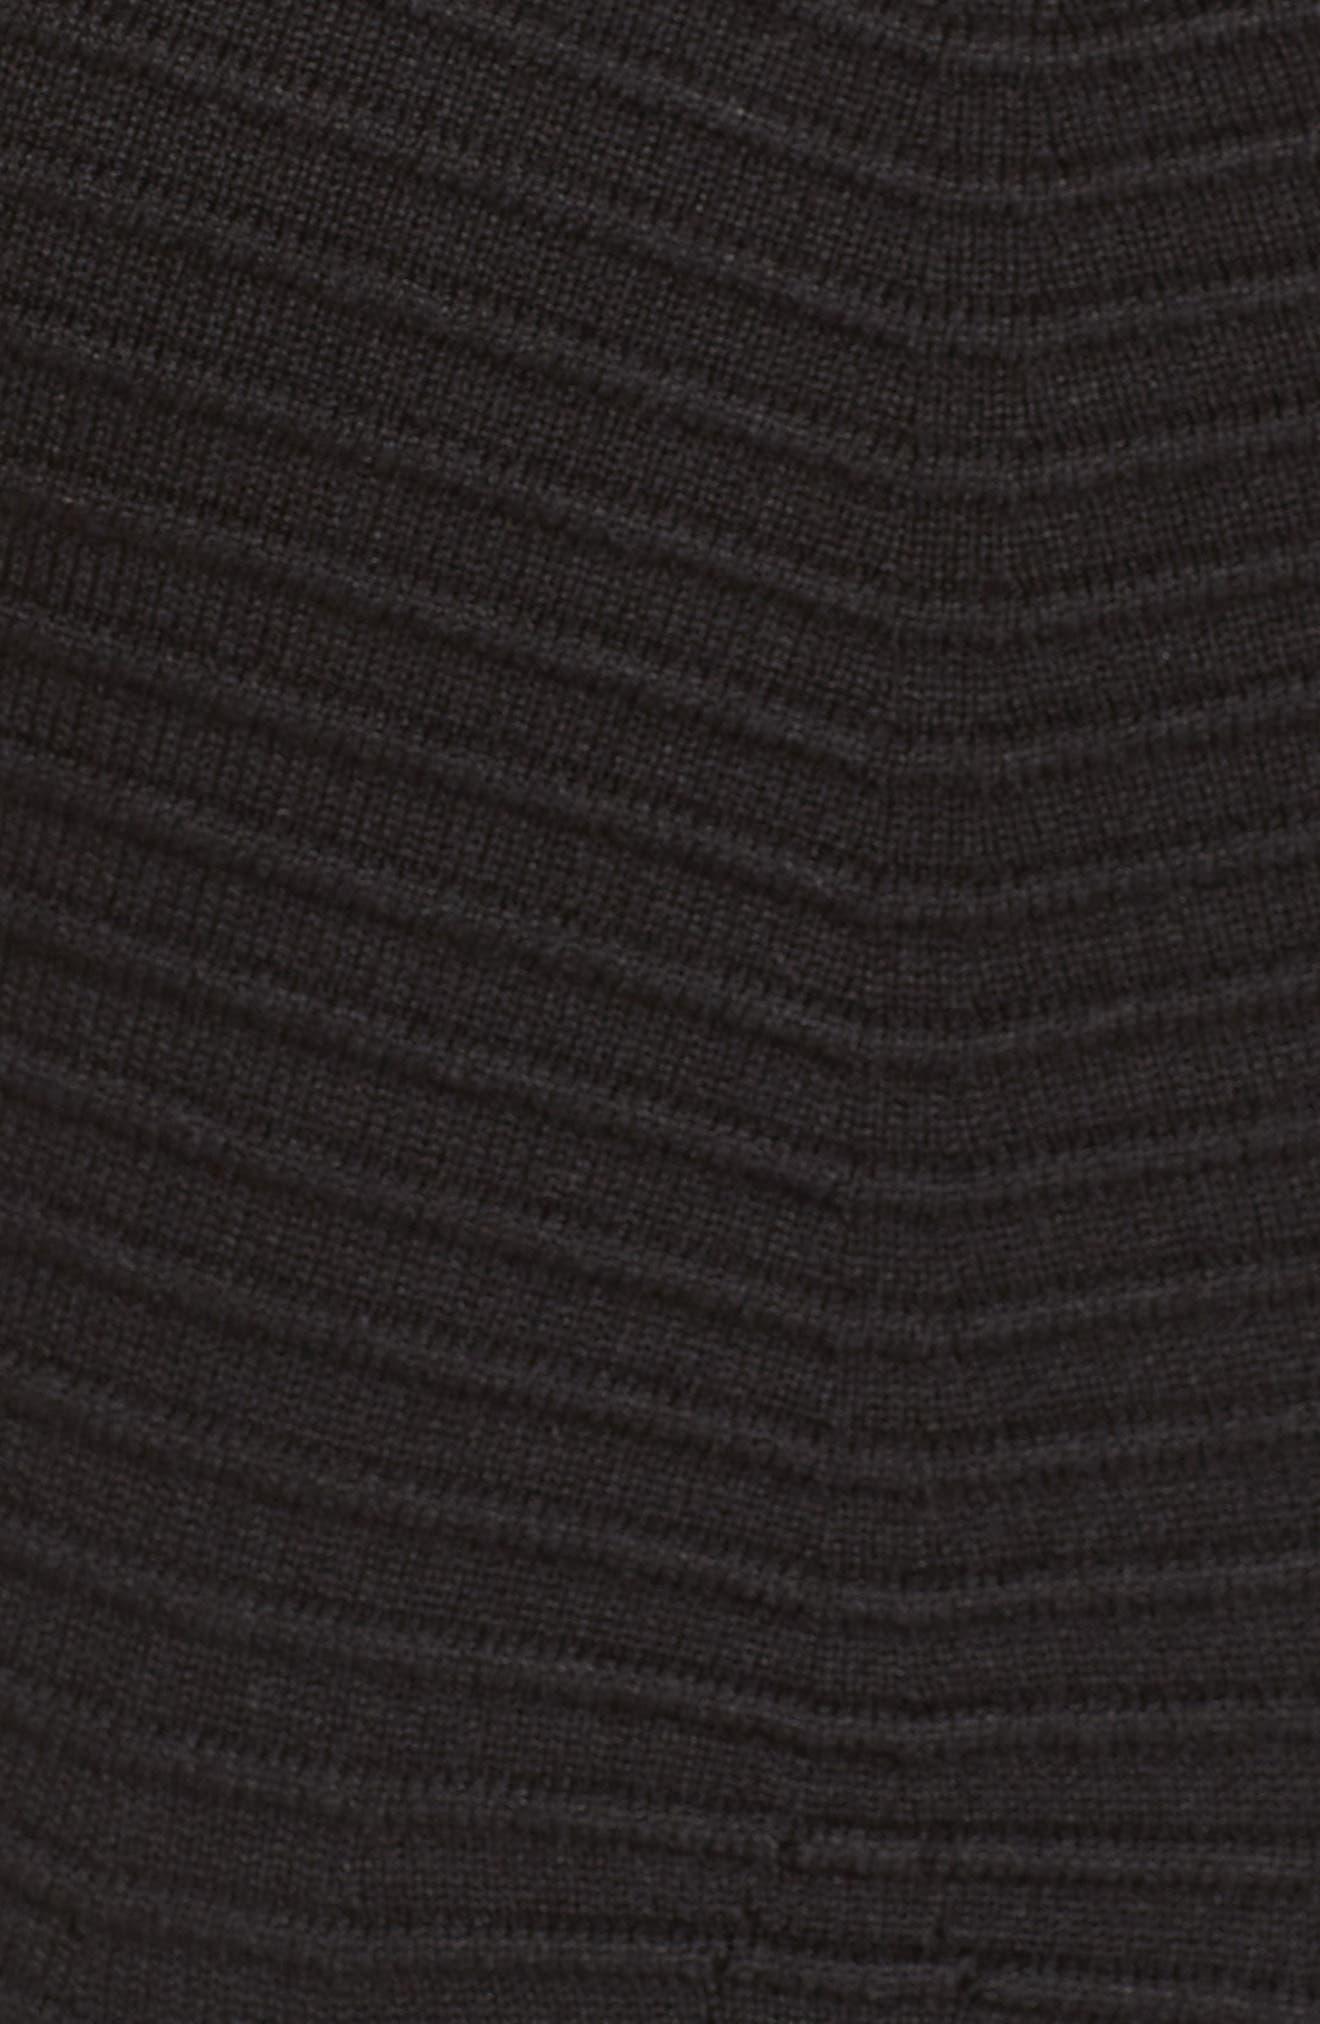 Chevron Fit & Flare Dress,                             Alternate thumbnail 6, color,                             001